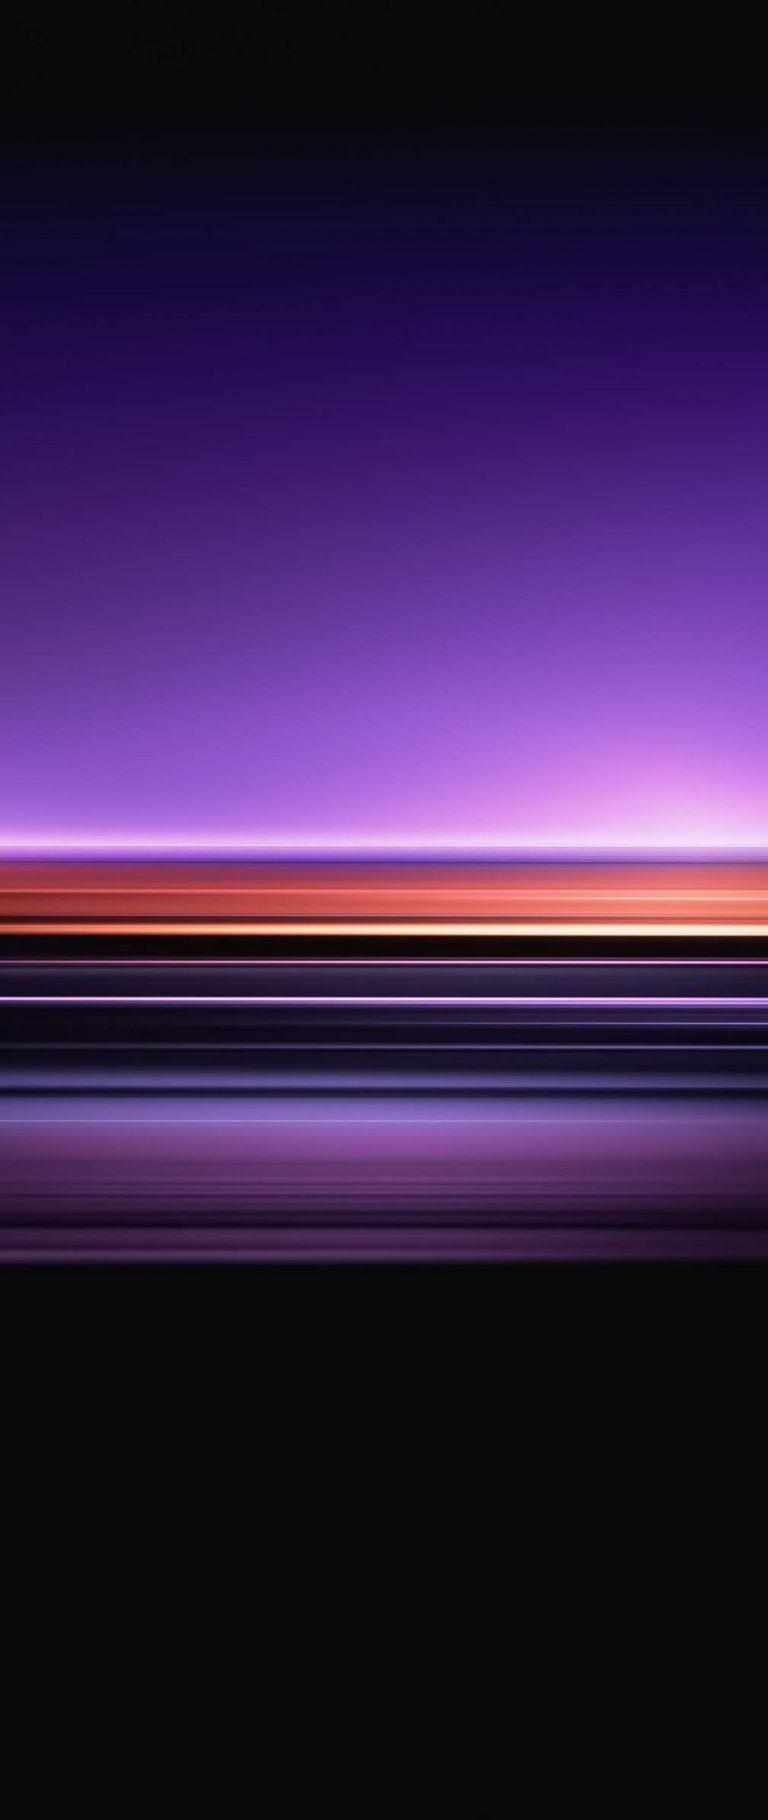 Sony Xperia 5 Stock Wallpaper 05 1080x2560 768x1820